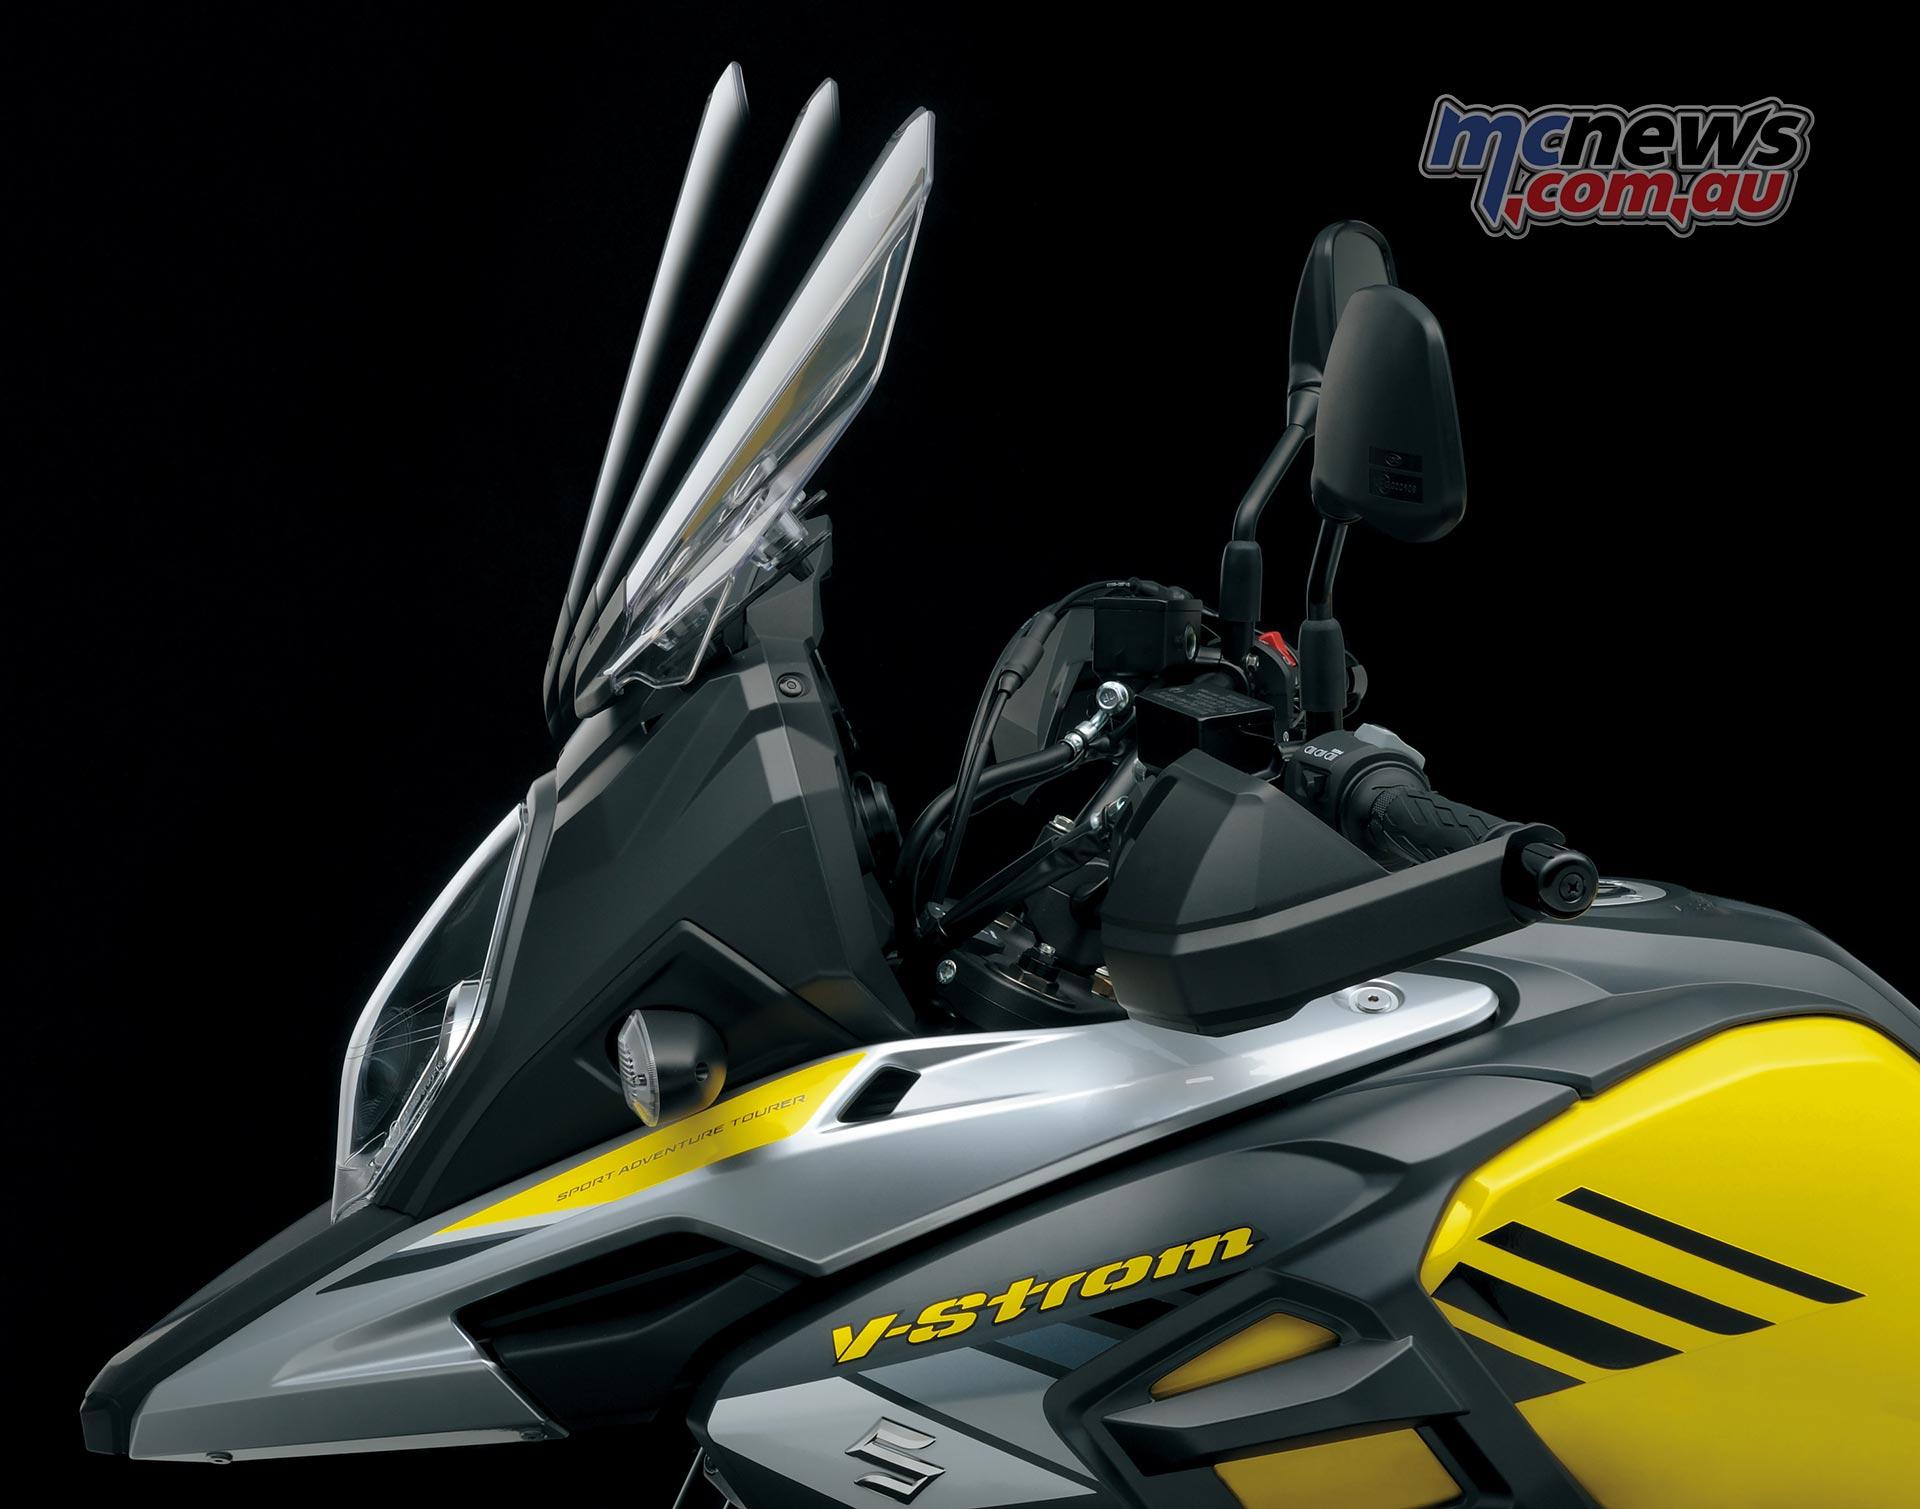 2017 Suzuki V-Strom DL1000 | V-Strom 1000 XT | MCNews com au